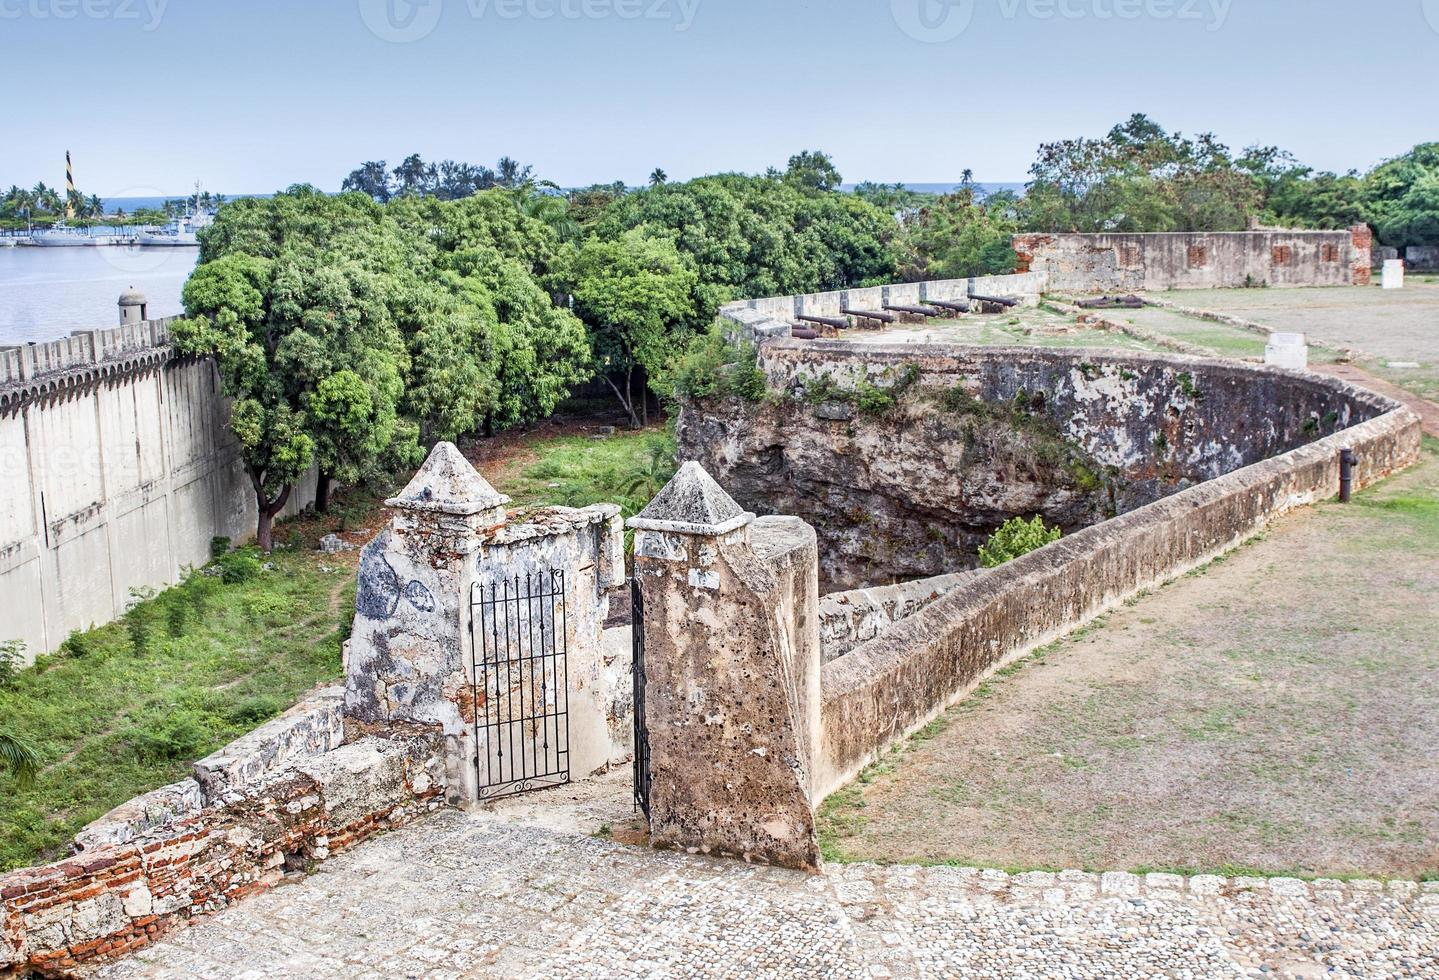 Ozama Fluss und Festung, Dominikanische Republik foto